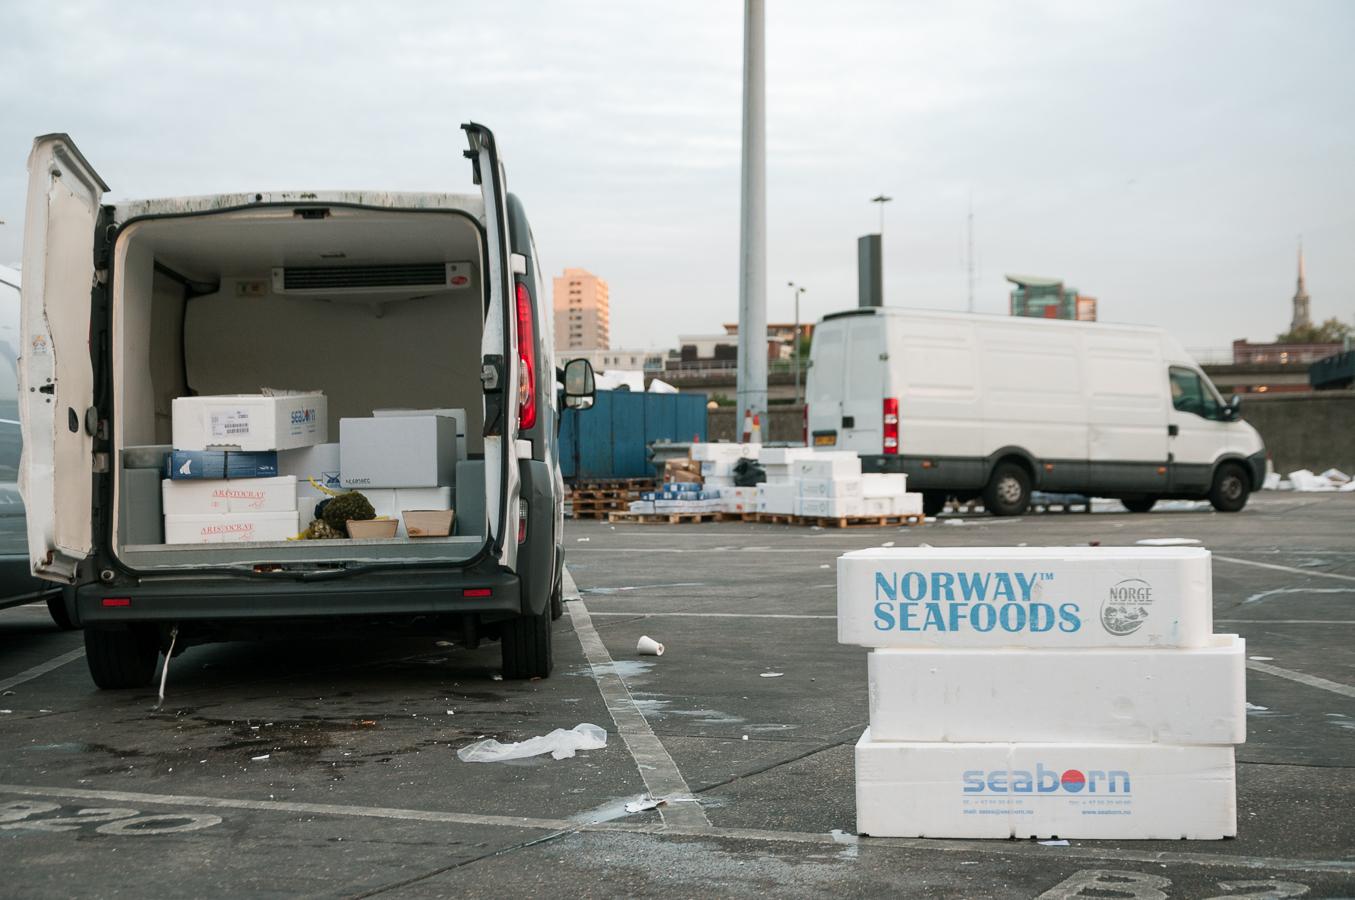 norway-seafoods-market.jpg